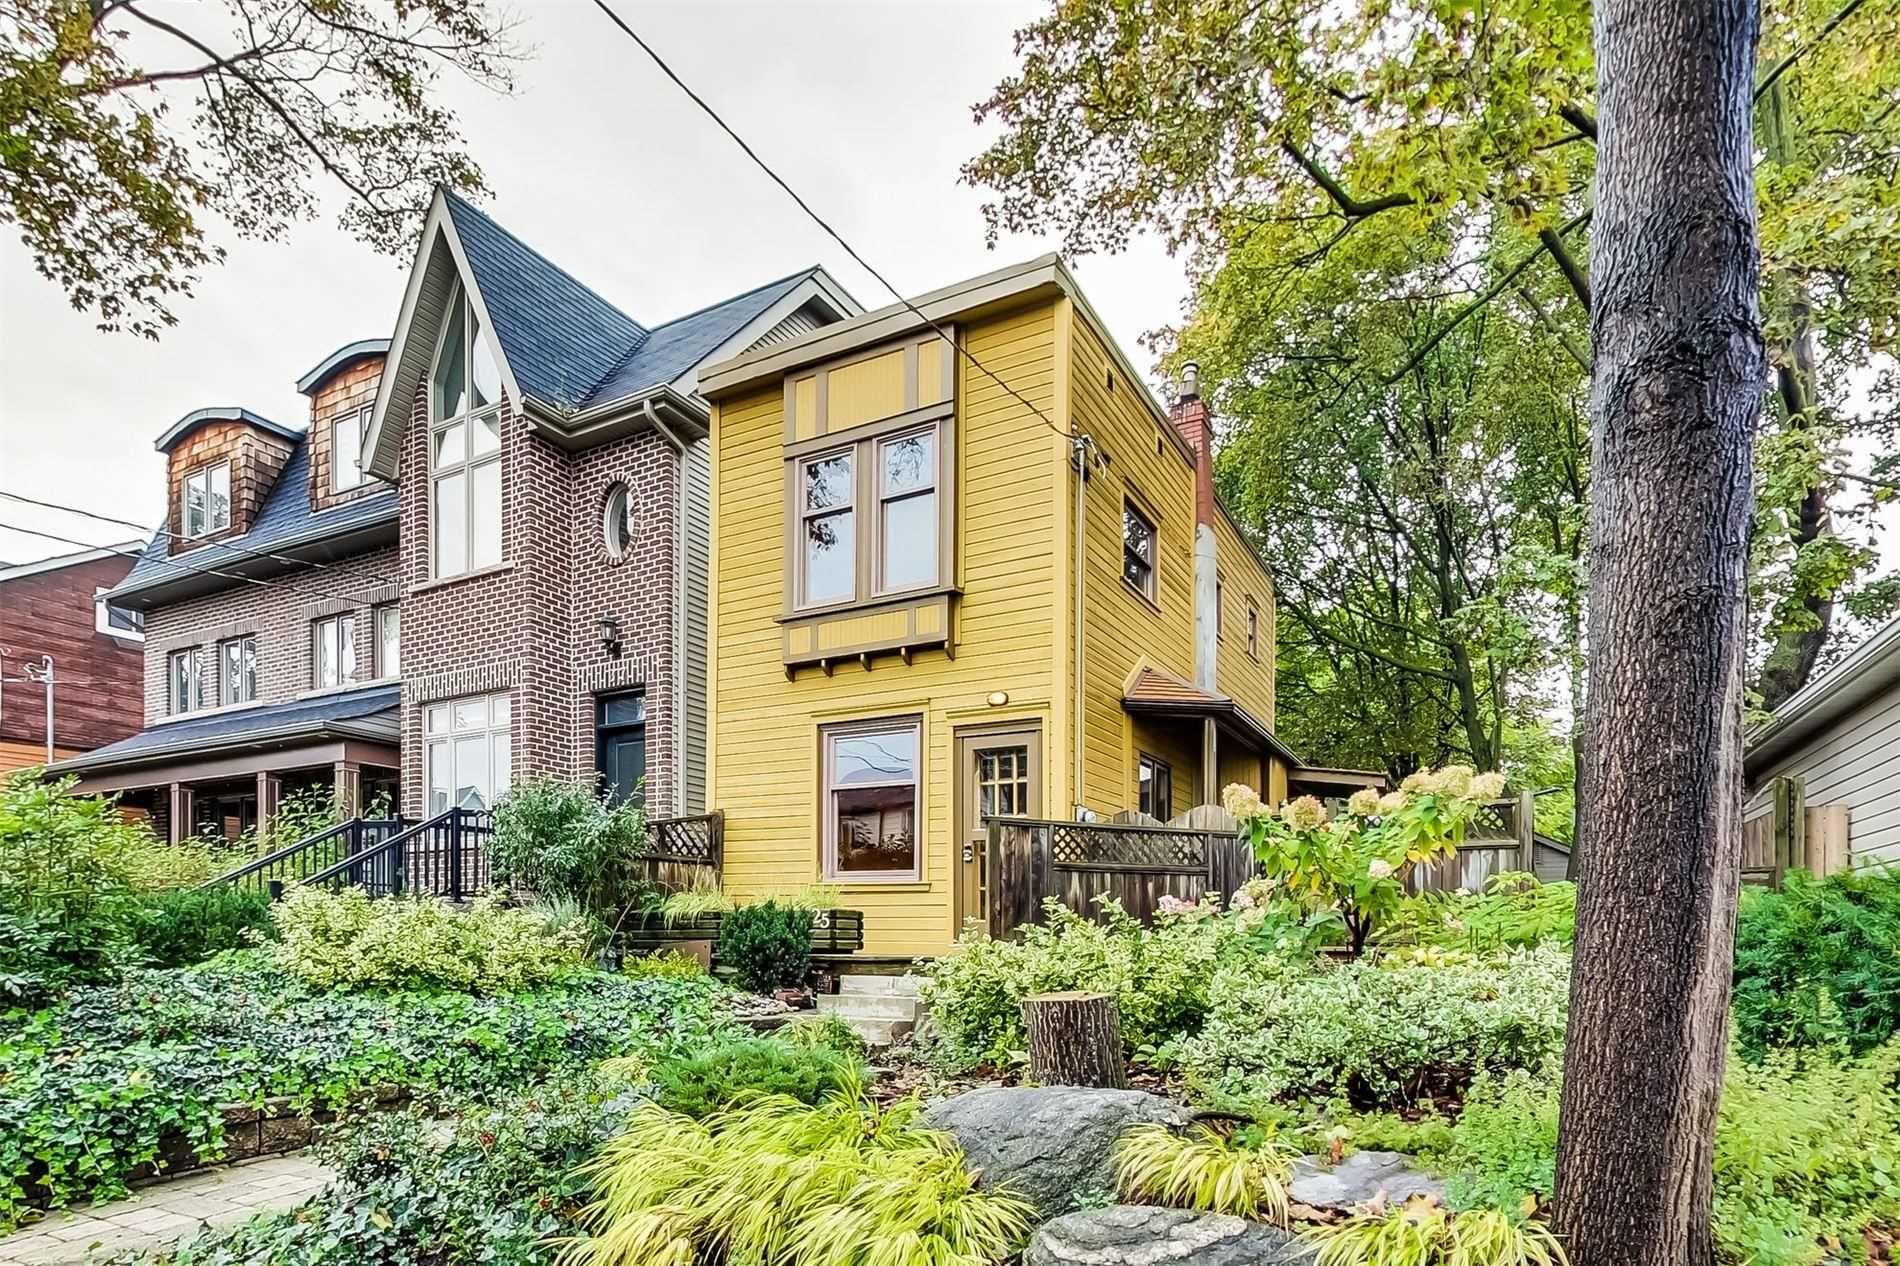 Main Photo: 25 Earl Grey Road in Toronto: Blake-Jones House (2-Storey) for sale (Toronto E01)  : MLS®# E4612632